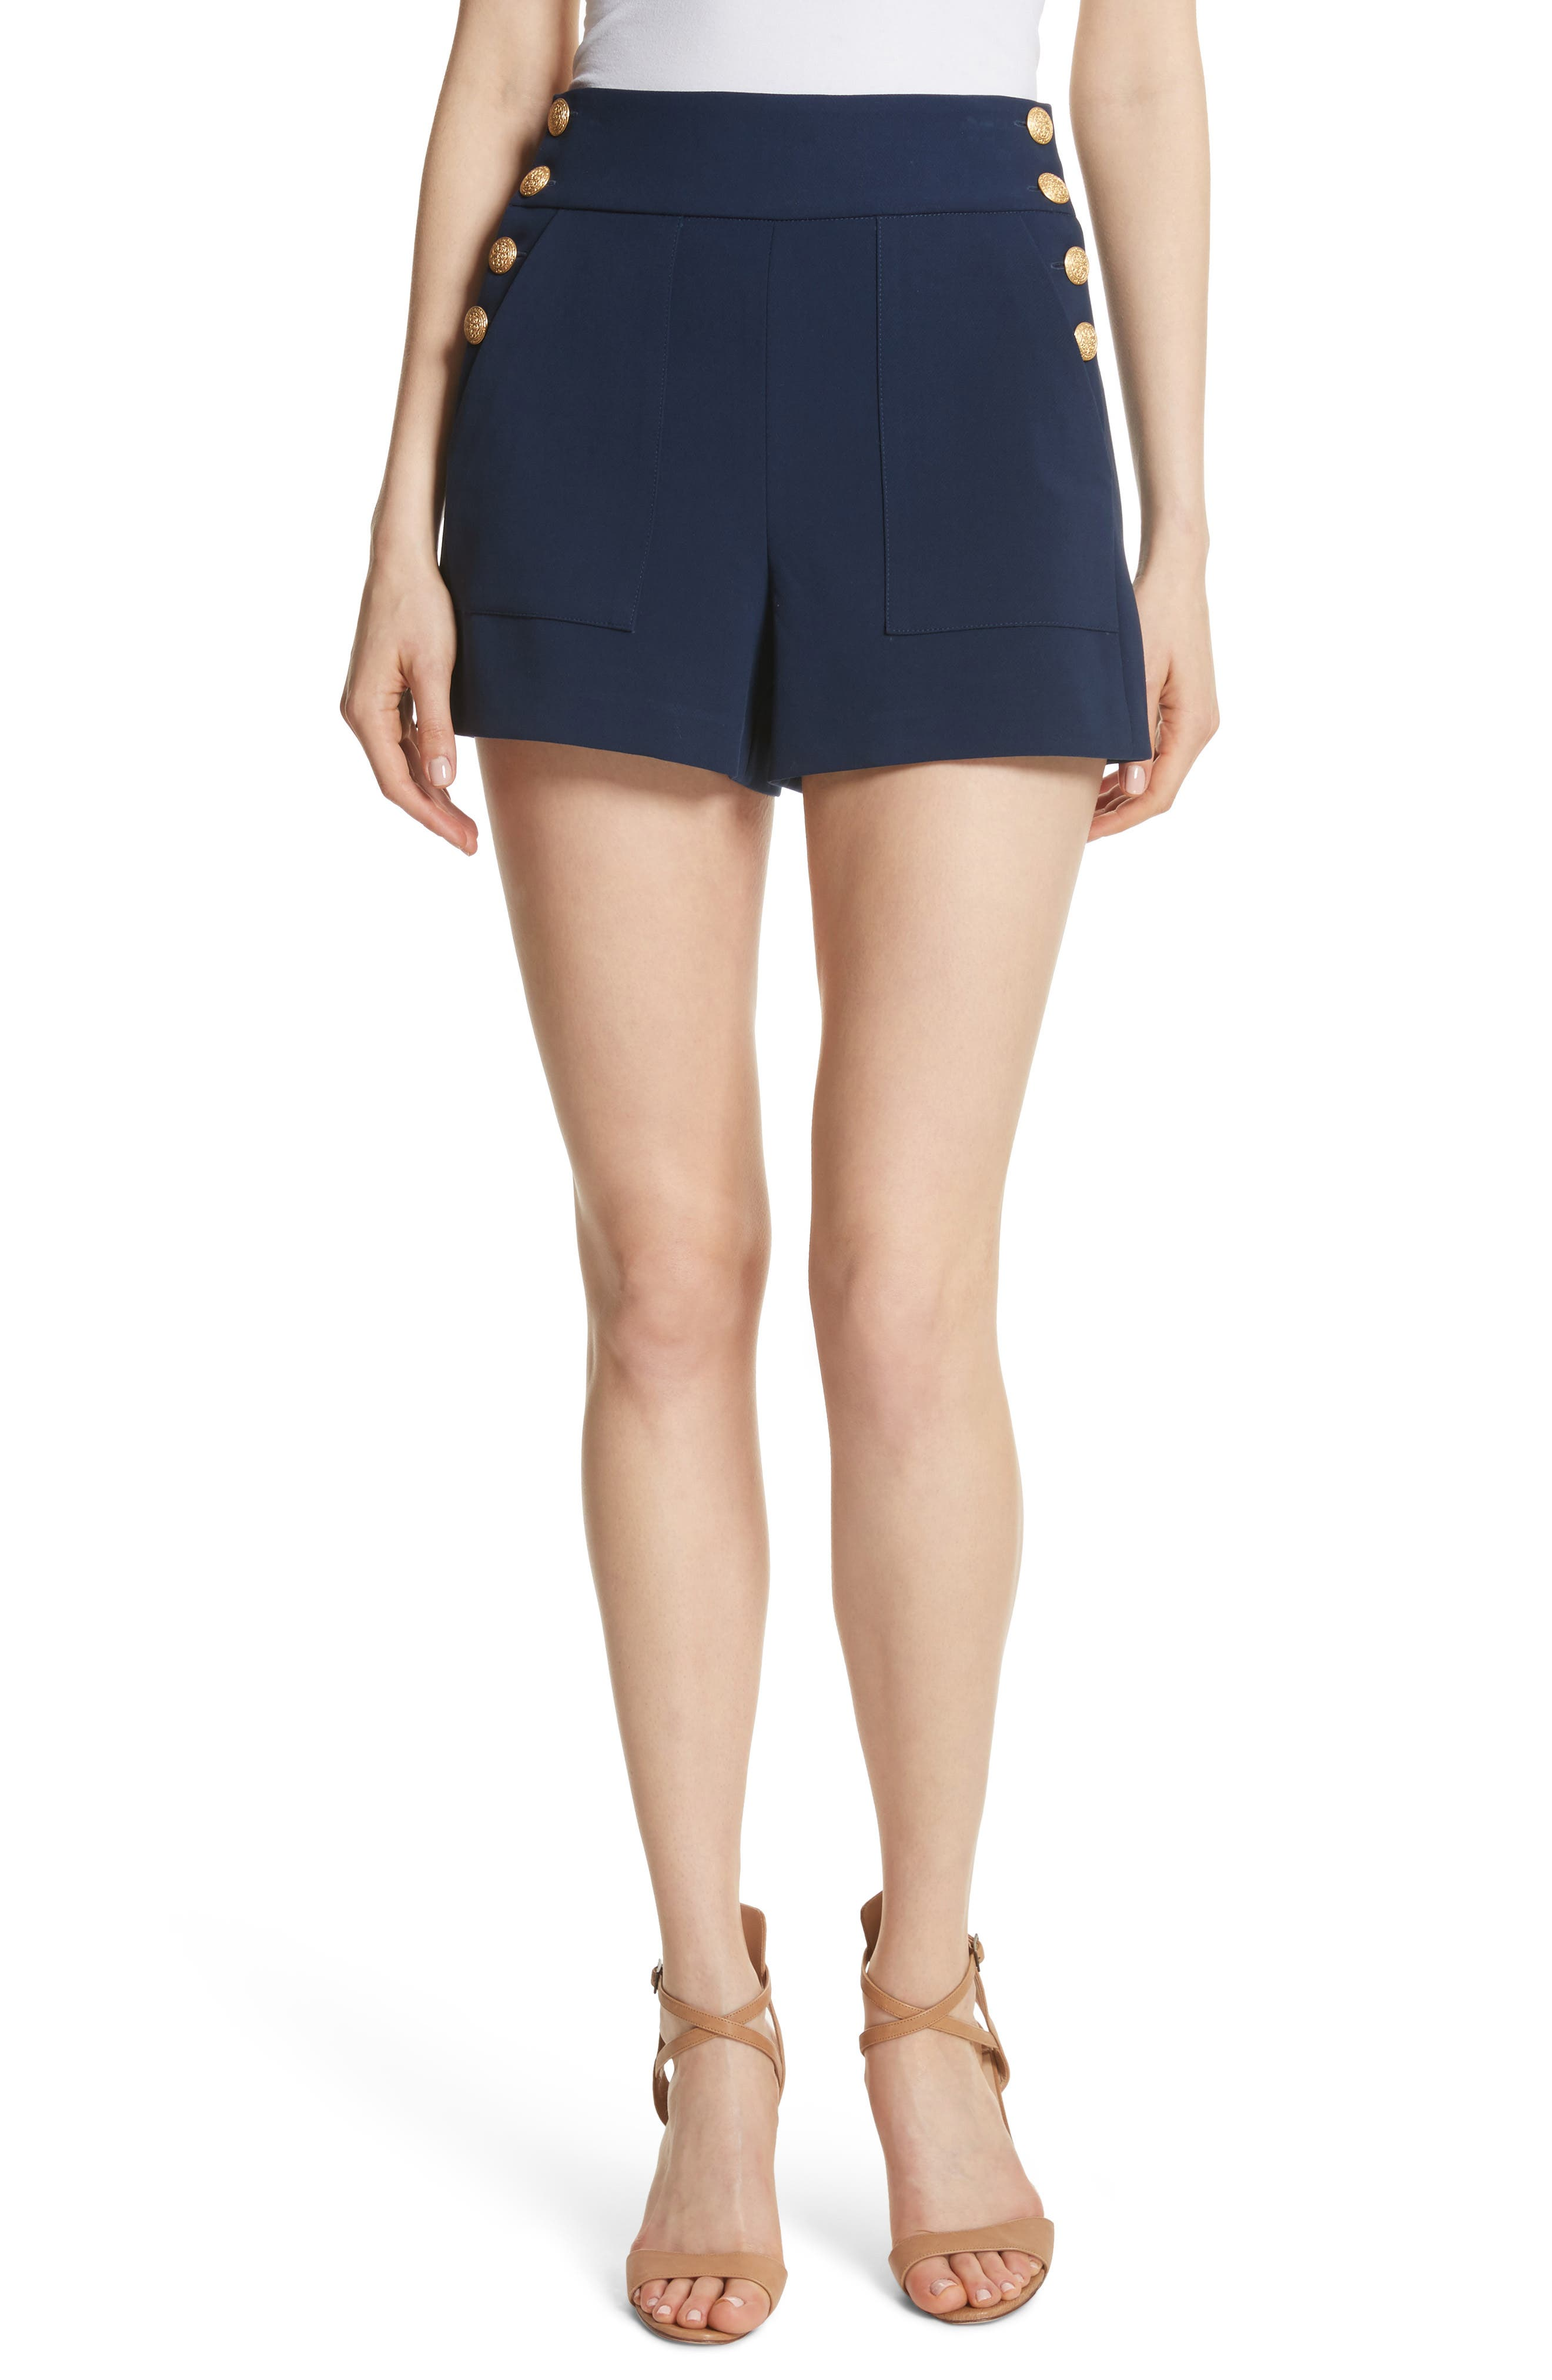 Donald High Waist Sailor Shorts,                             Main thumbnail 1, color,                             Sapphire